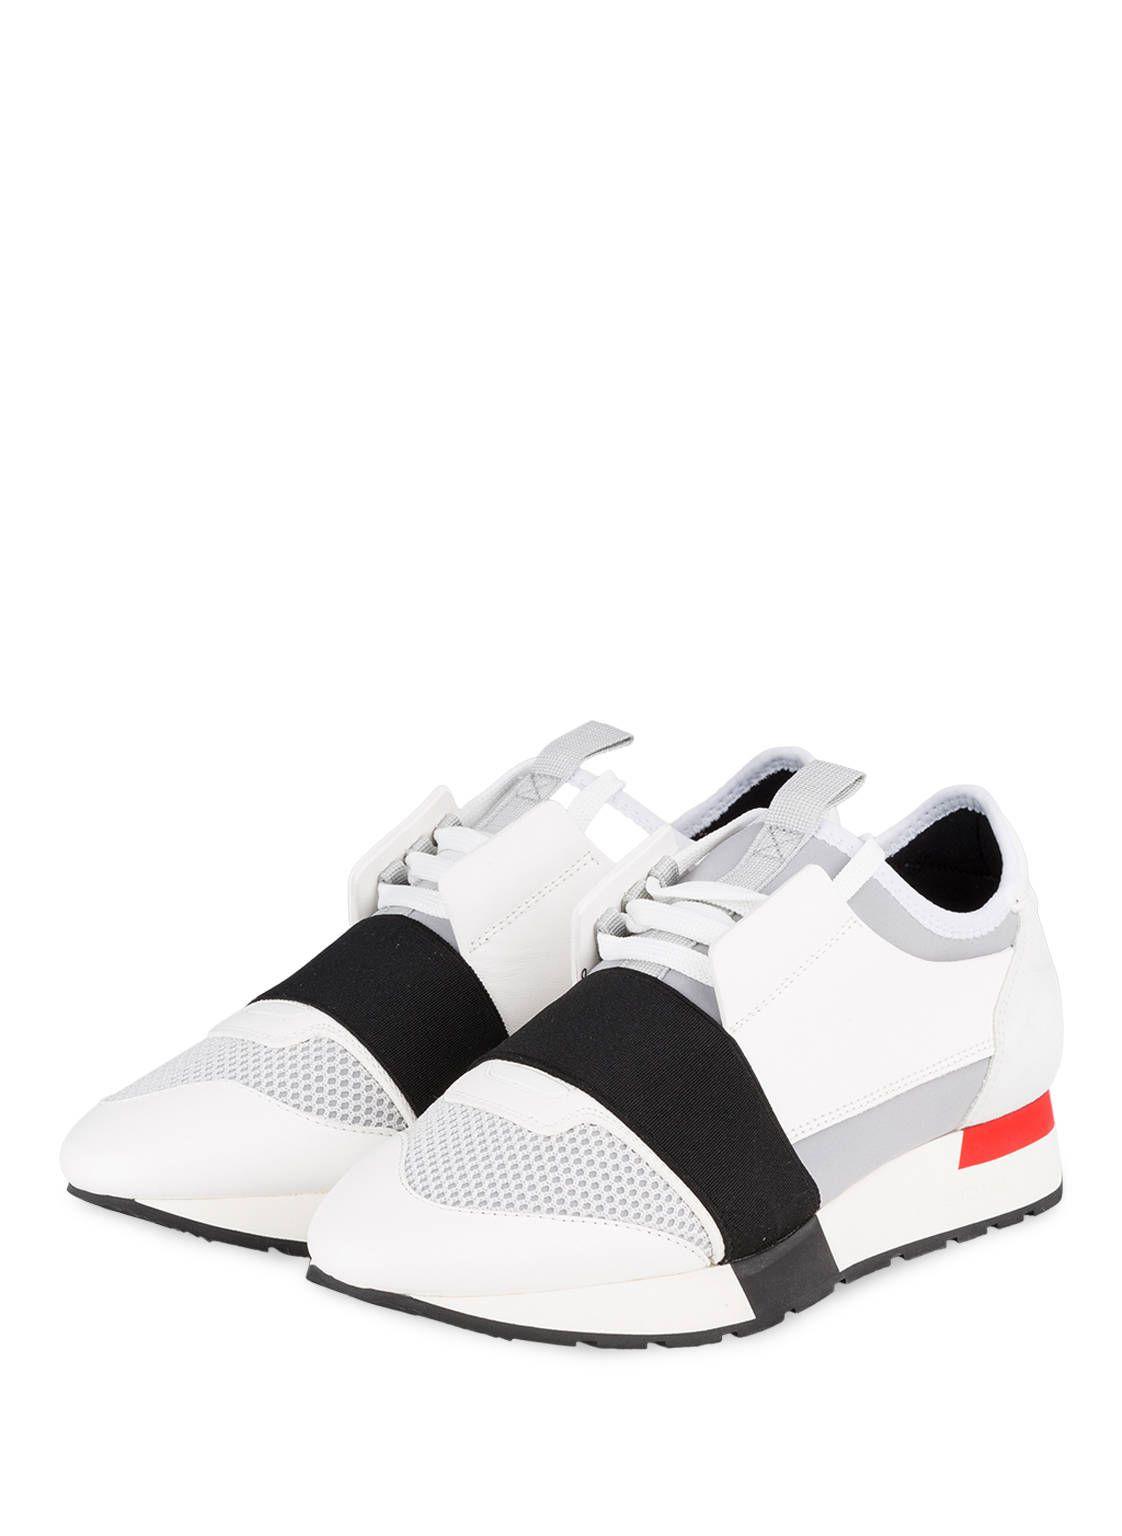 look for exclusive shoes detailed images Sneaker RACE RUNNER von BALENCIAGA bei Breuninger kaufen ...